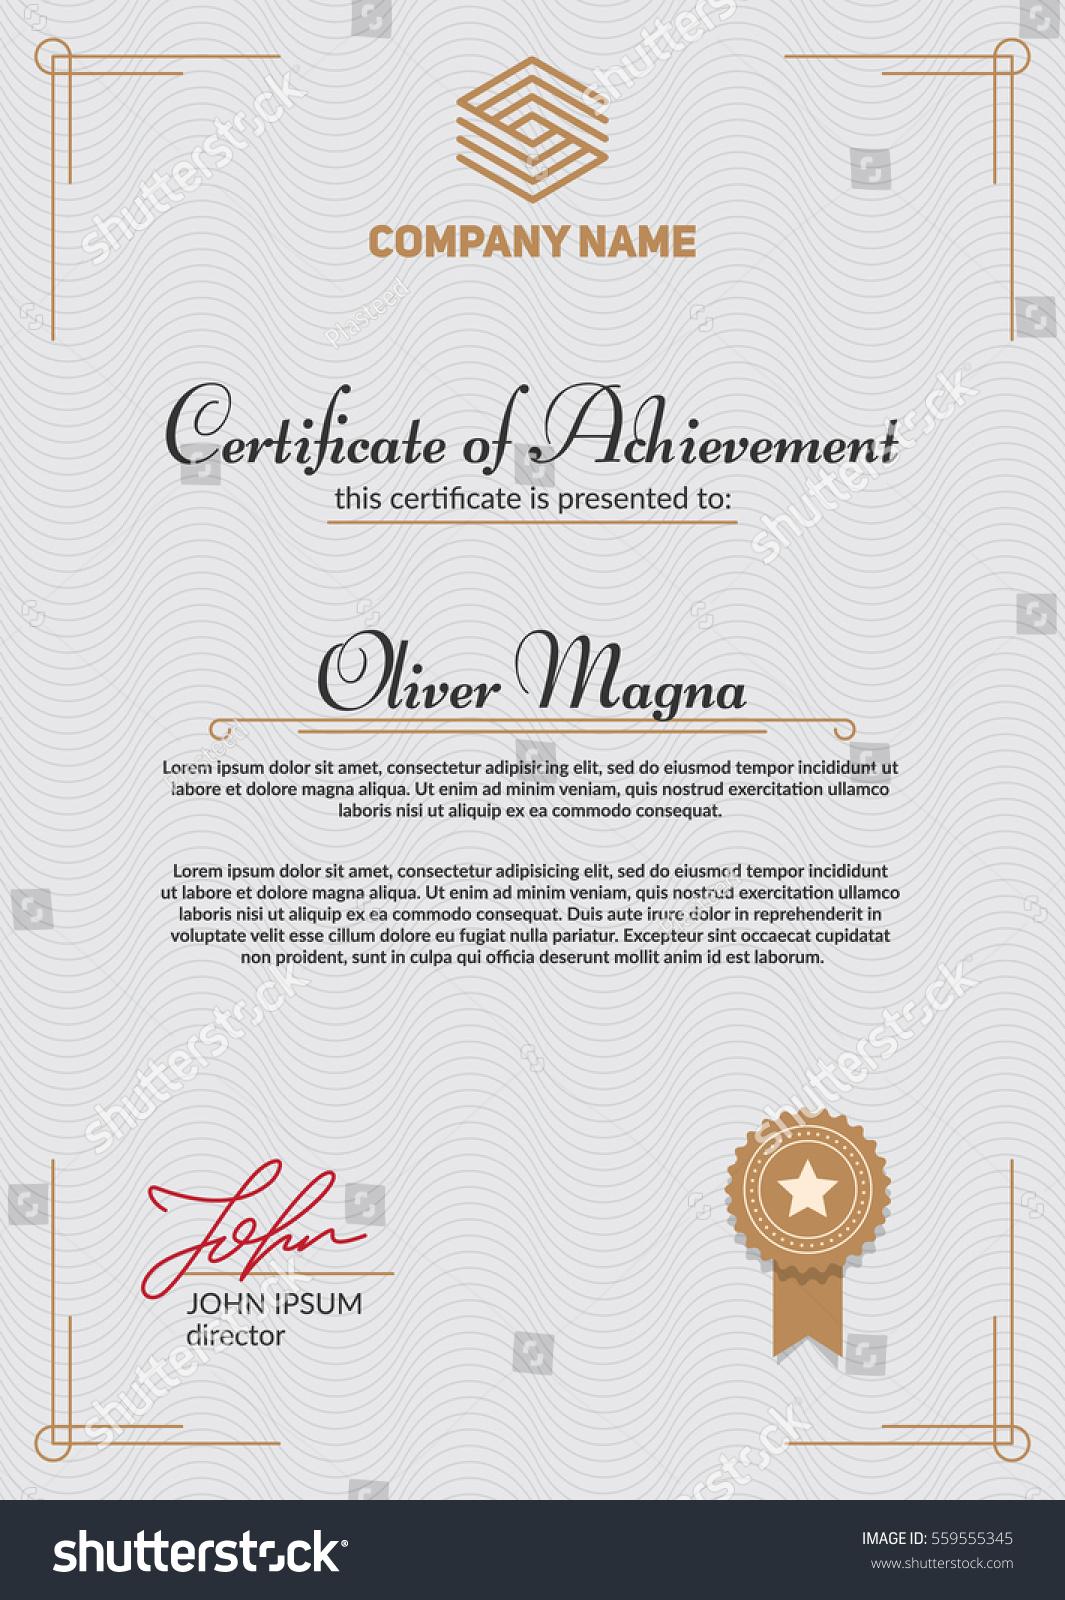 Authentic certificate template cool elegant design stock vector authentic certificate template cool elegant design eps10 vector alramifo Images